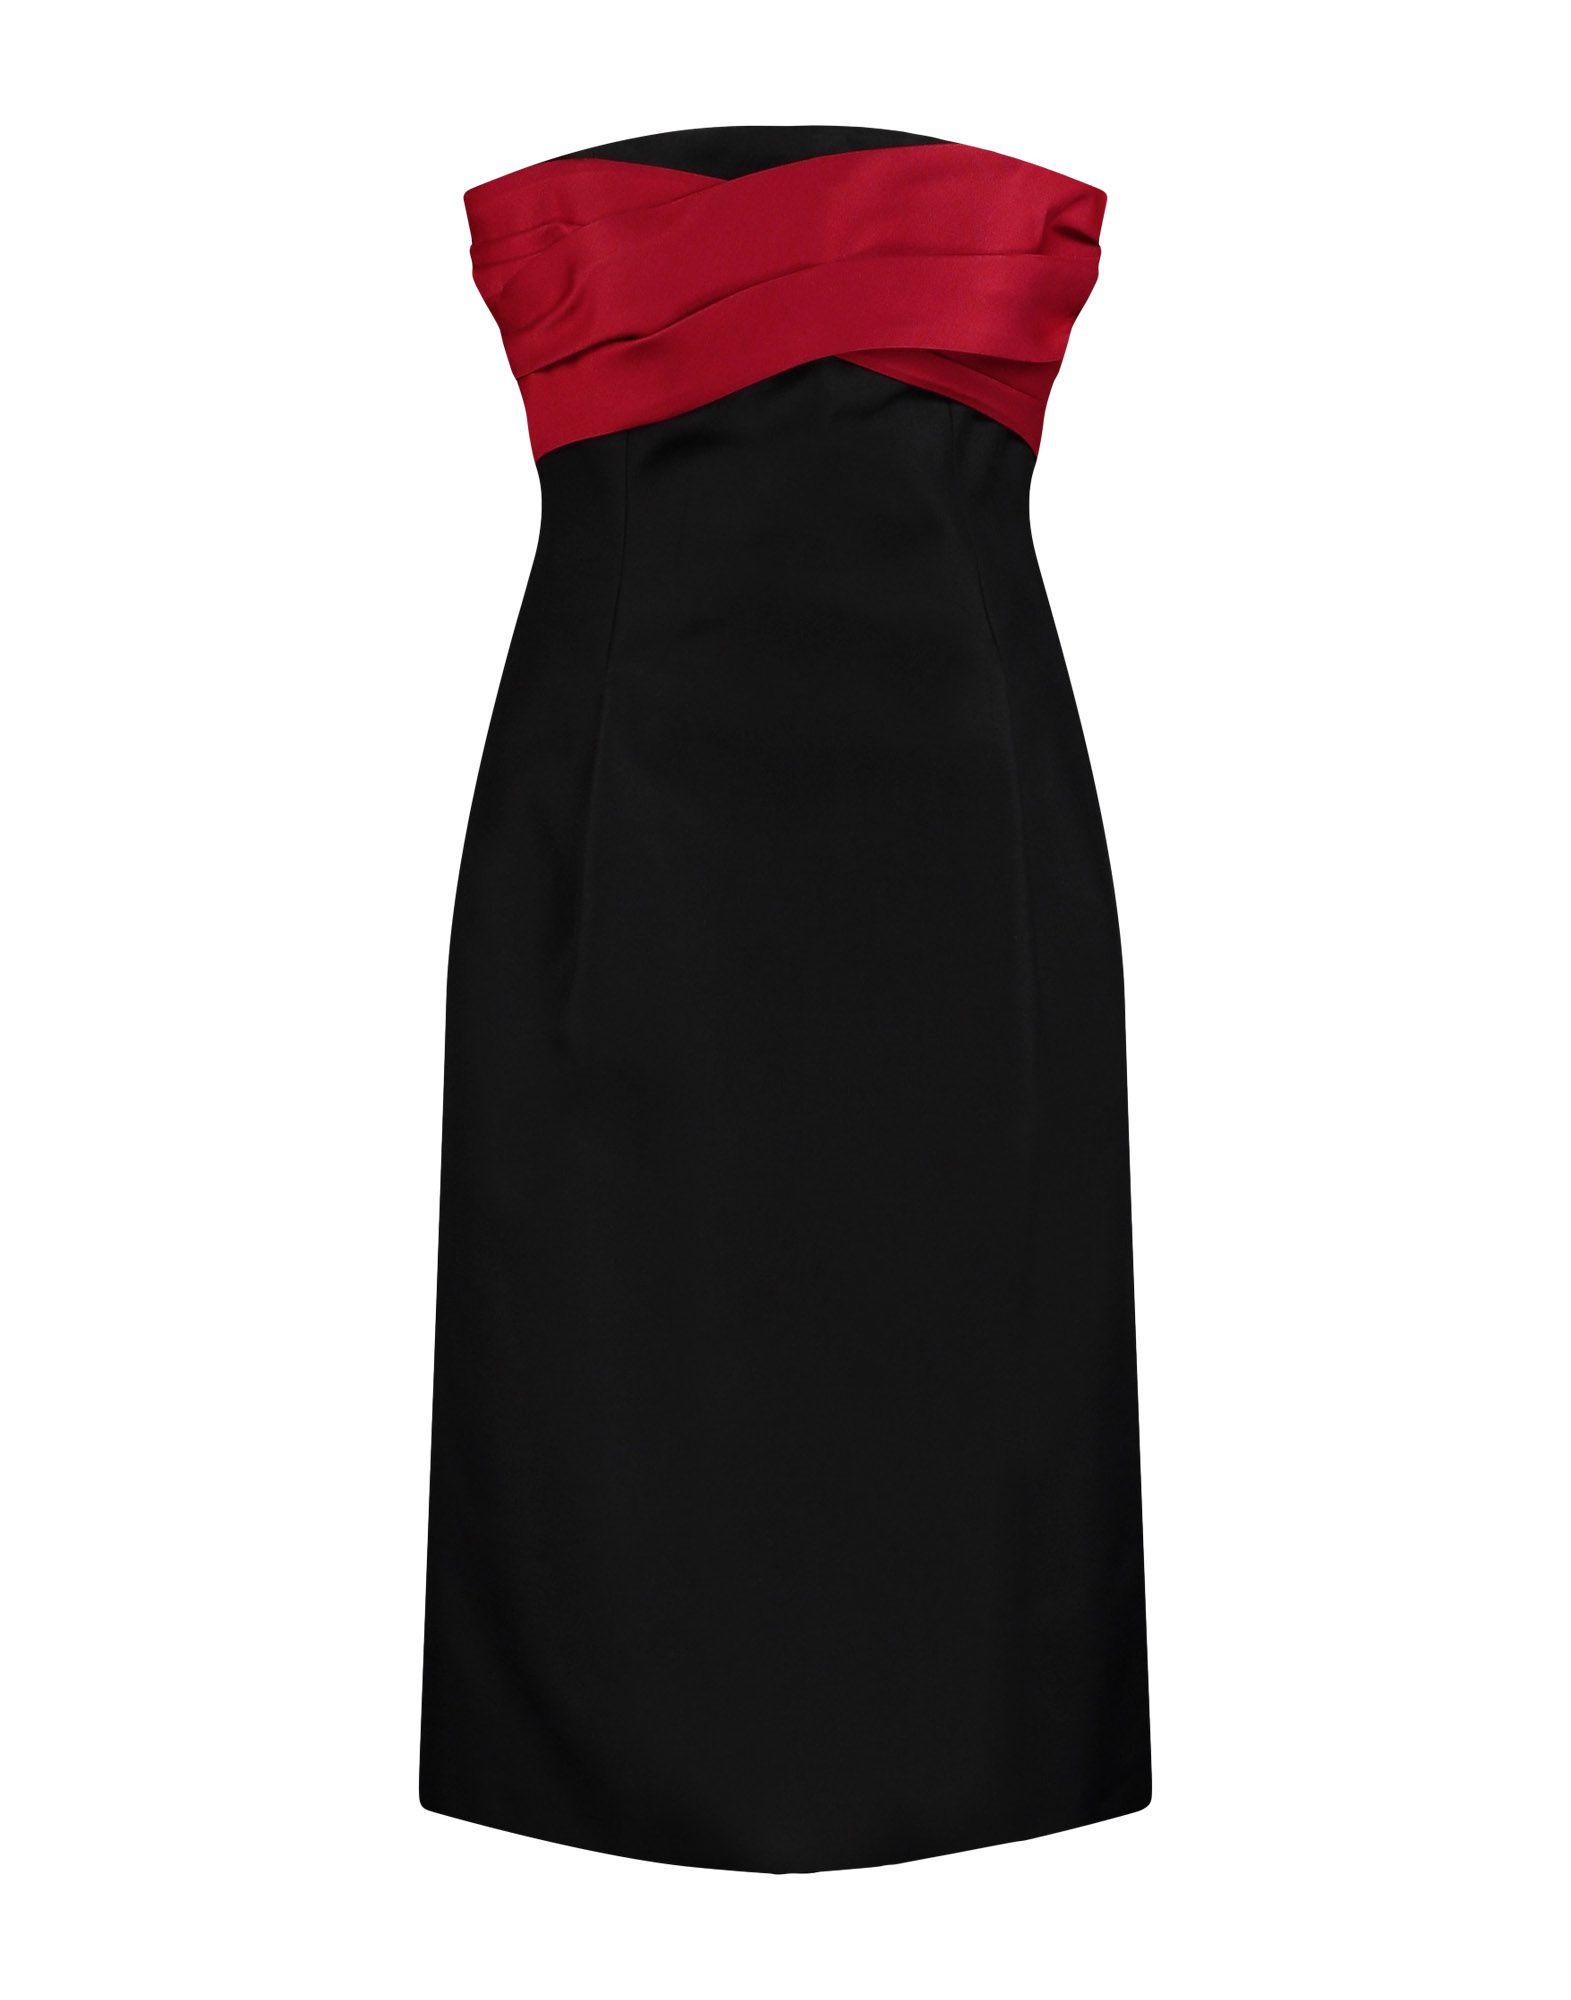 Фото - MICHAEL KORS COLLECTION Платье до колена michael kors collection юбка до колена